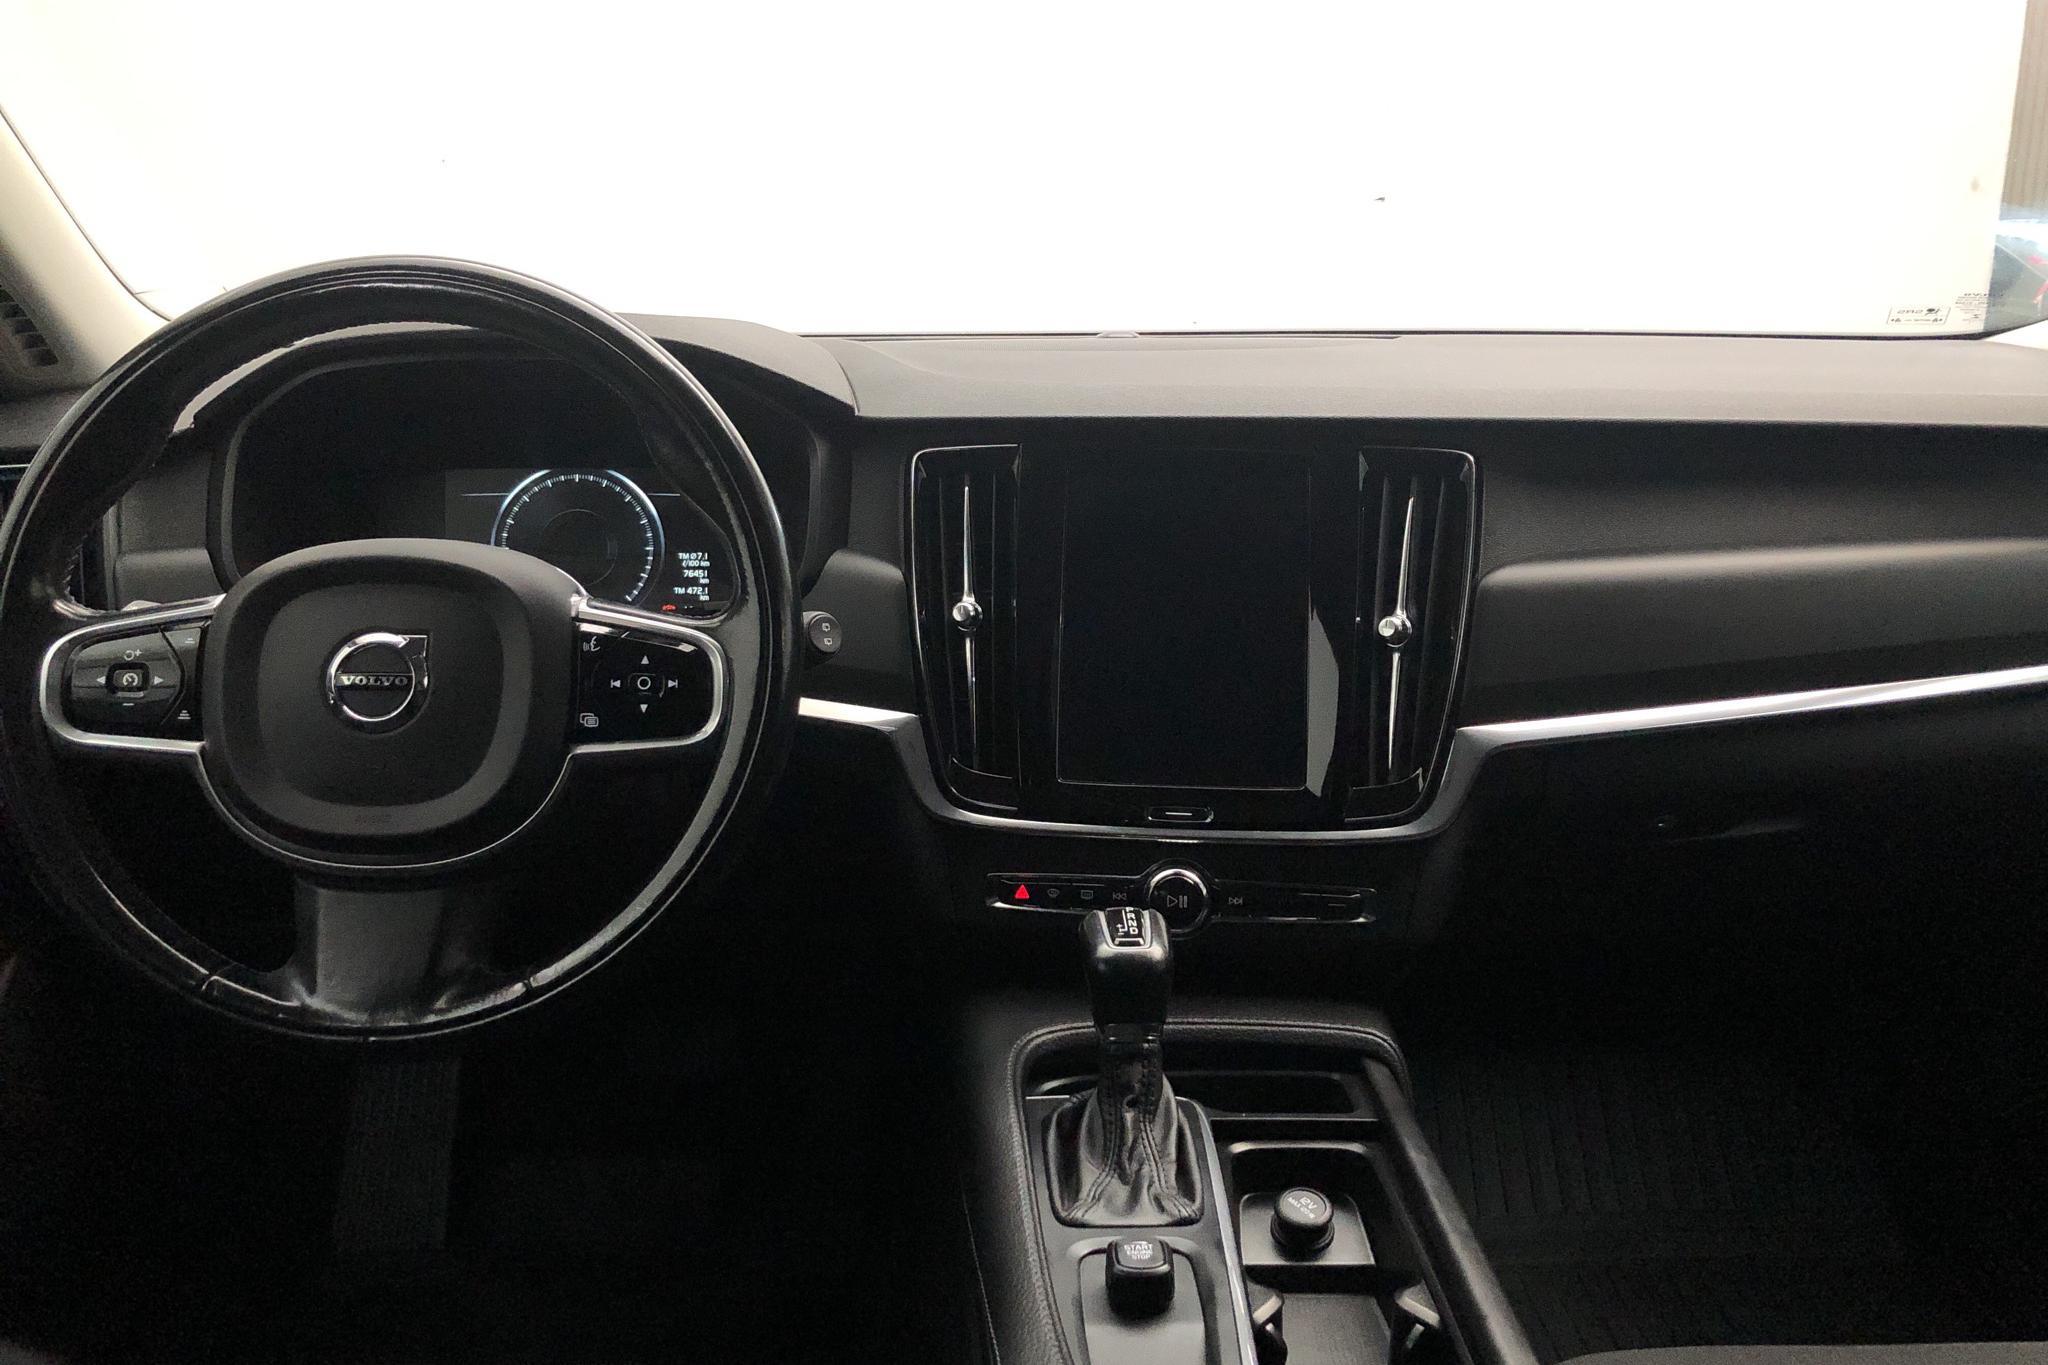 Volvo V90 D4 (190hk) - 76 440 km - Automatic - gray - 2018